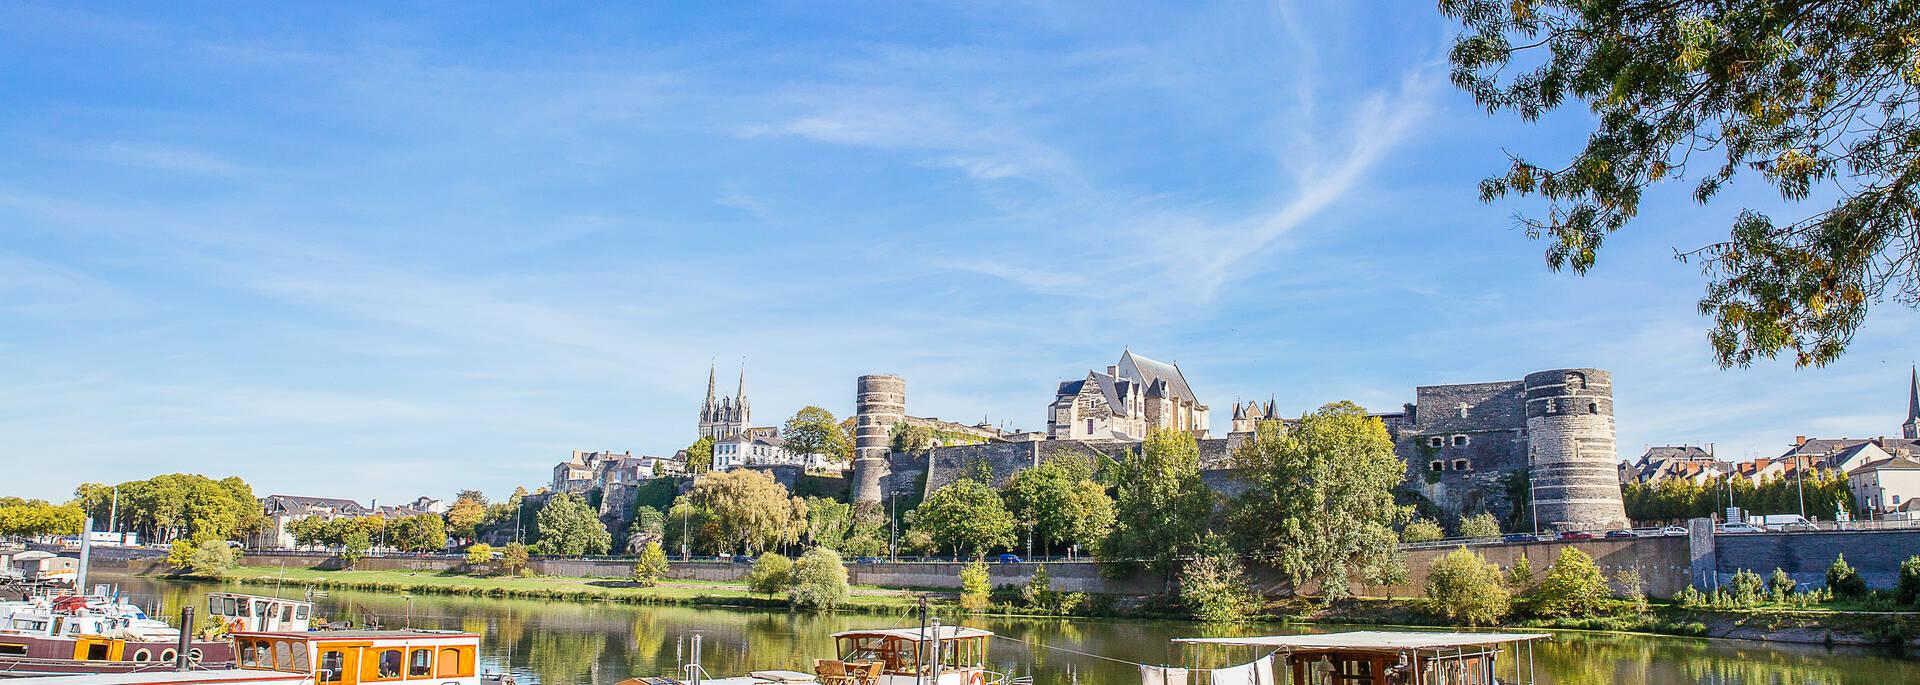 Visita Angers como grupo © Les Conteurs